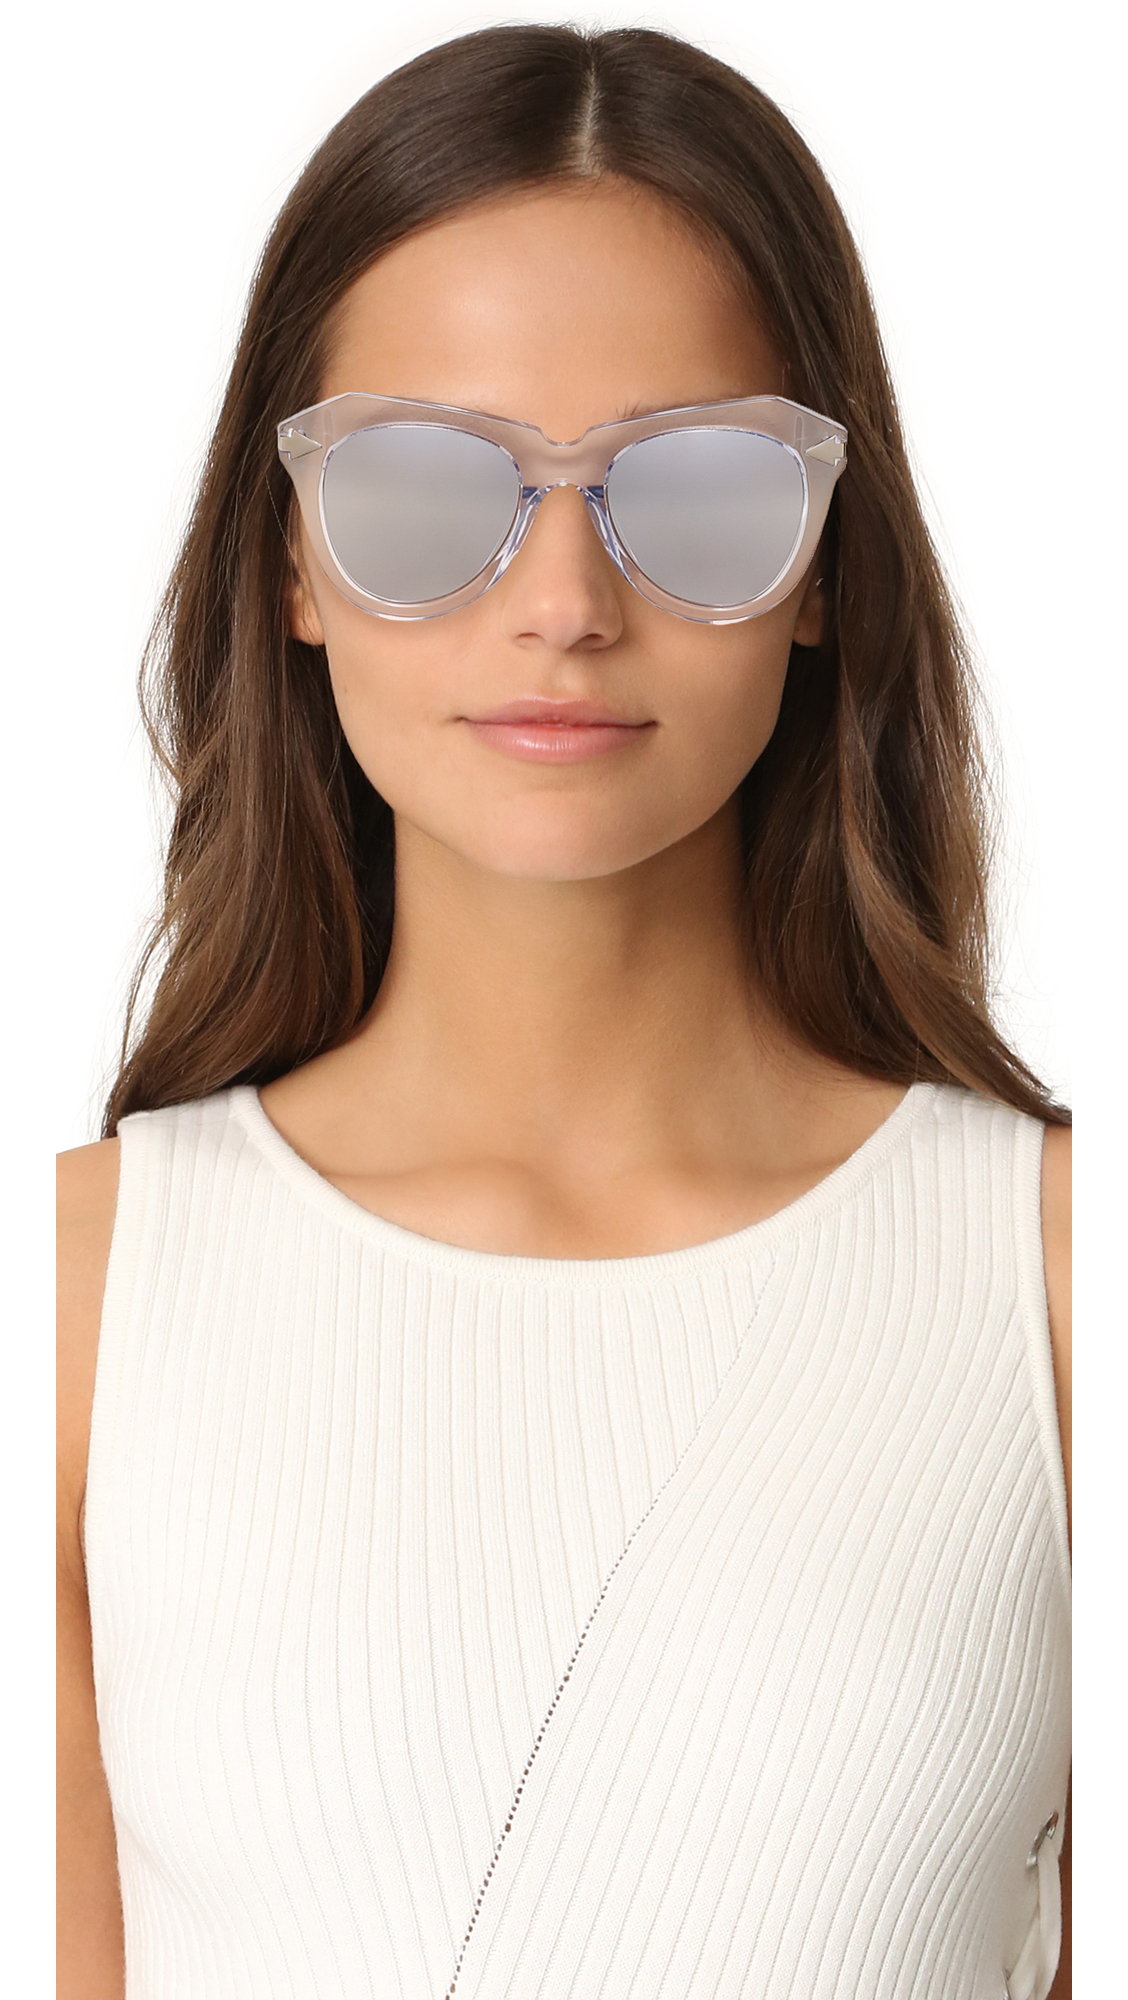 6e1f1d156842 Karen Walker One Star Sunglasses